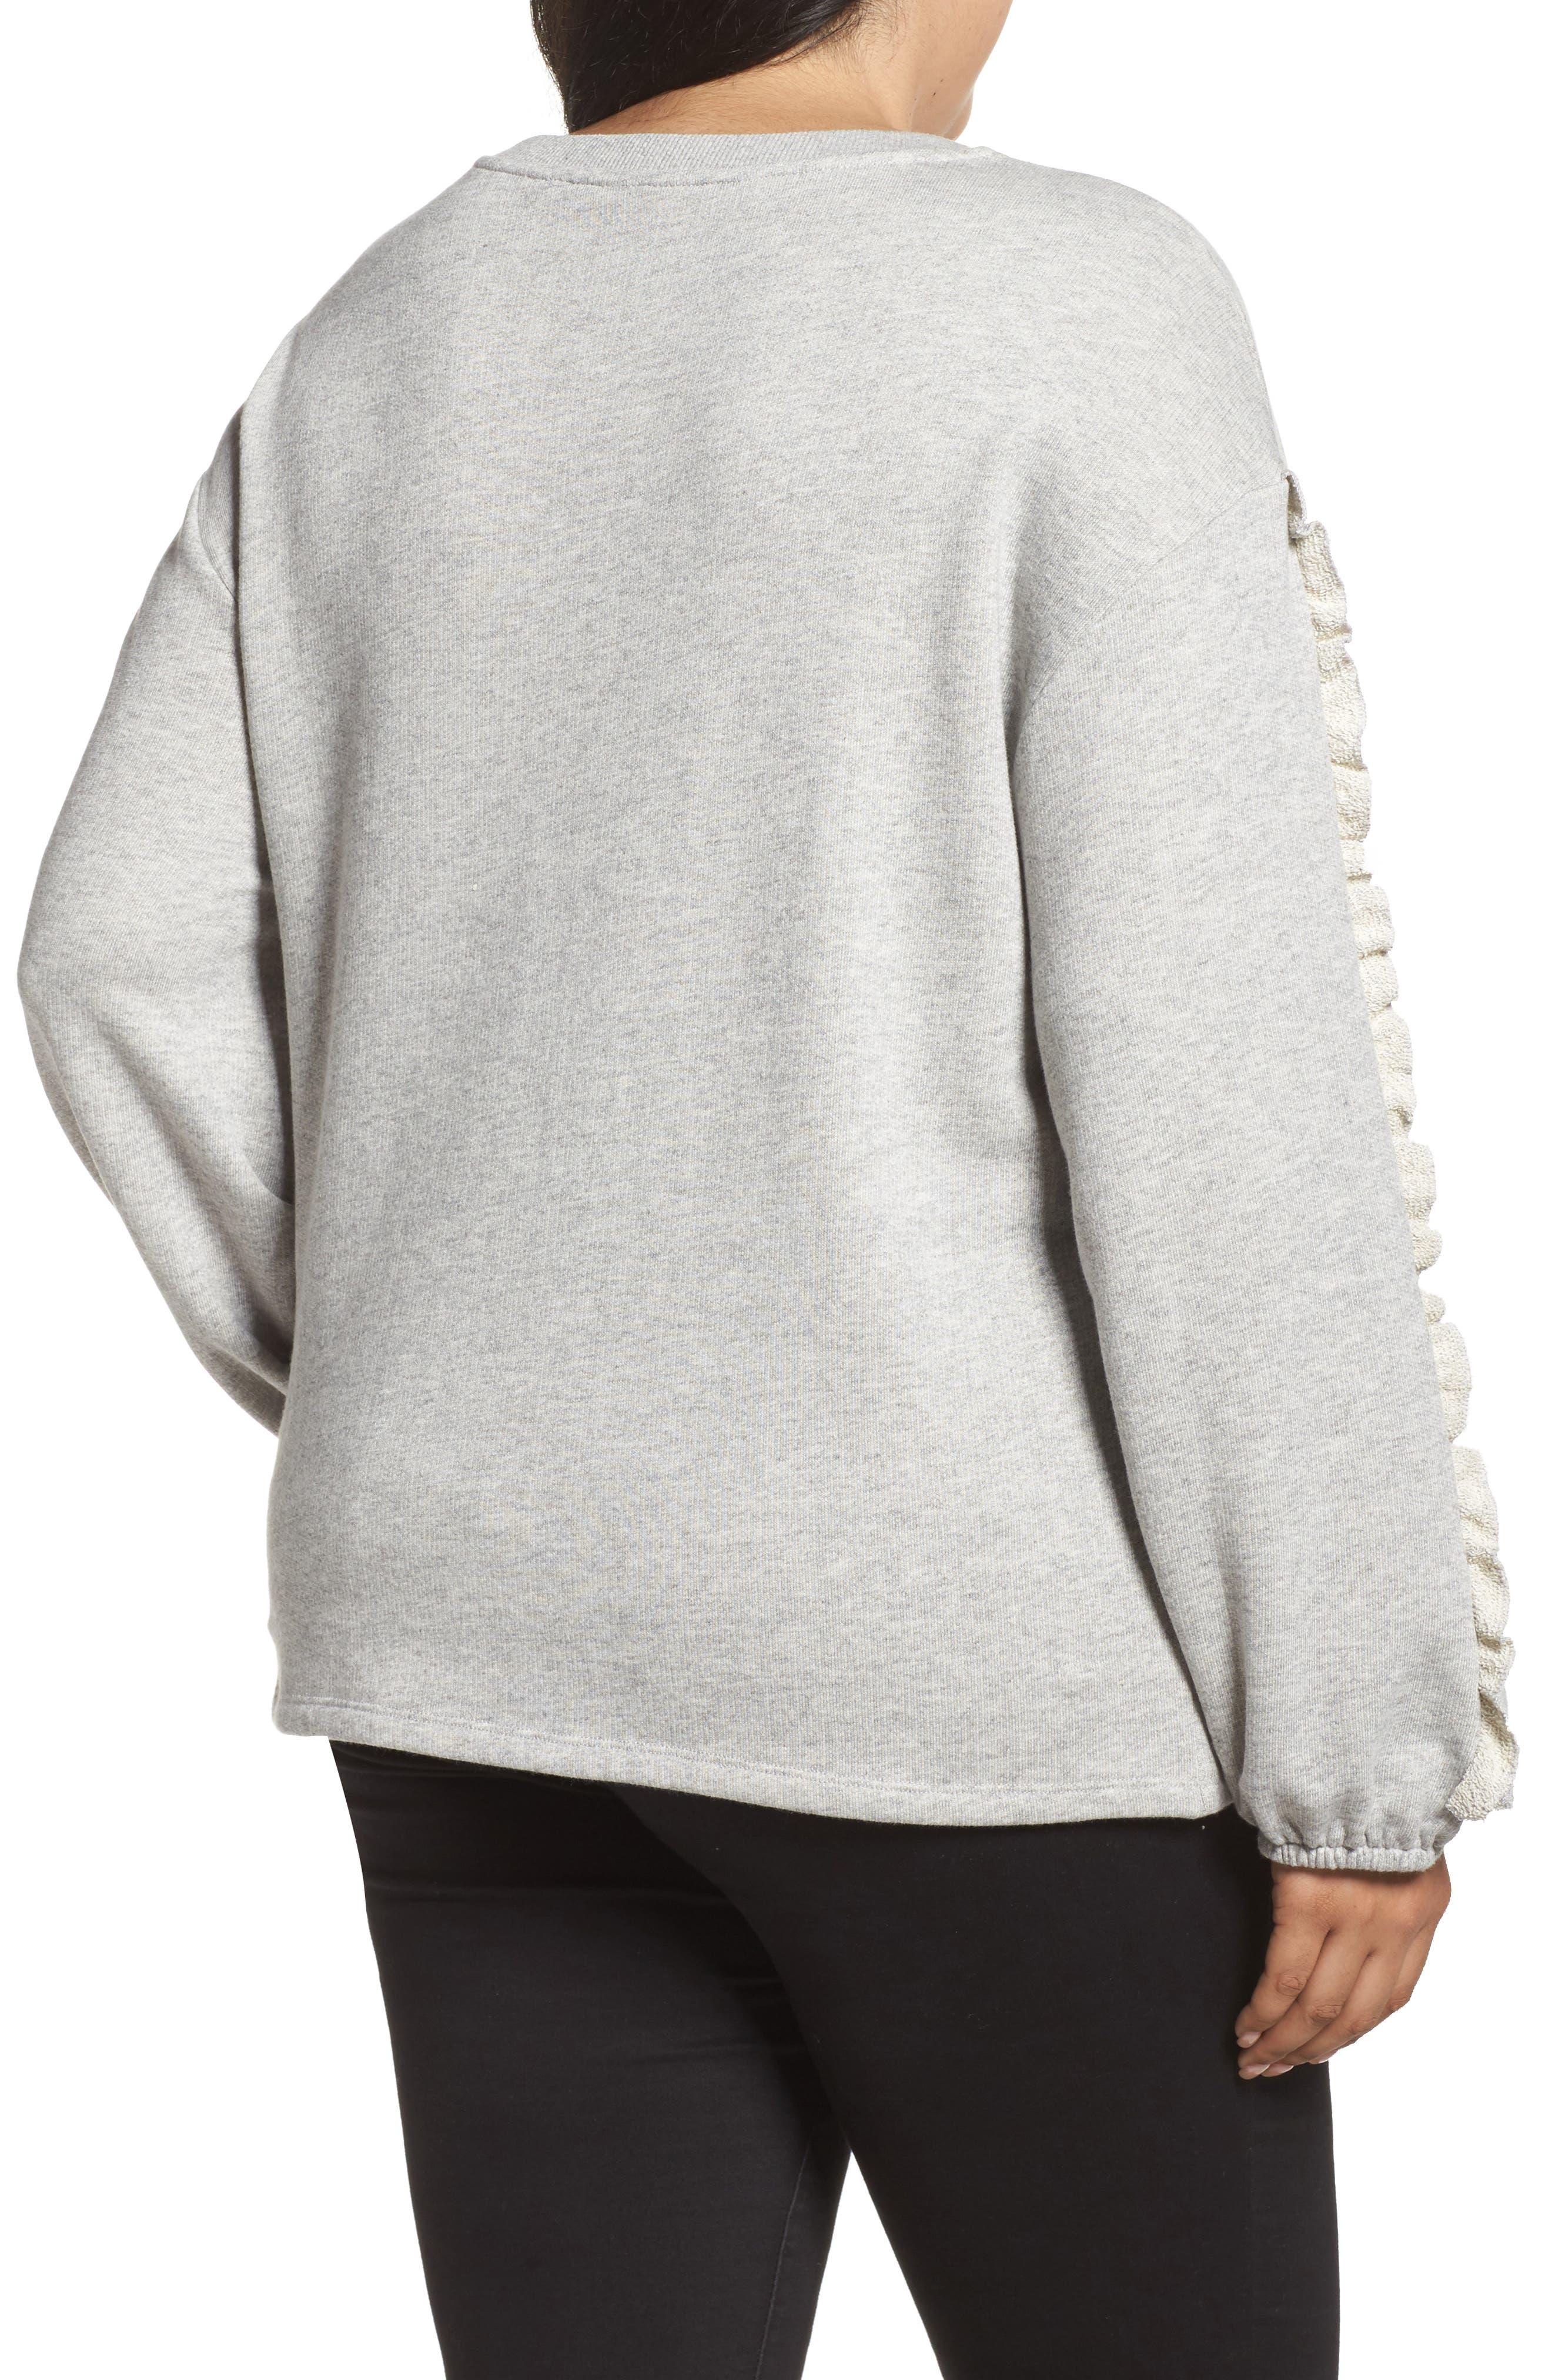 Ruffle Sleeve Sweatshirt,                             Alternate thumbnail 2, color,                             Grey Heather